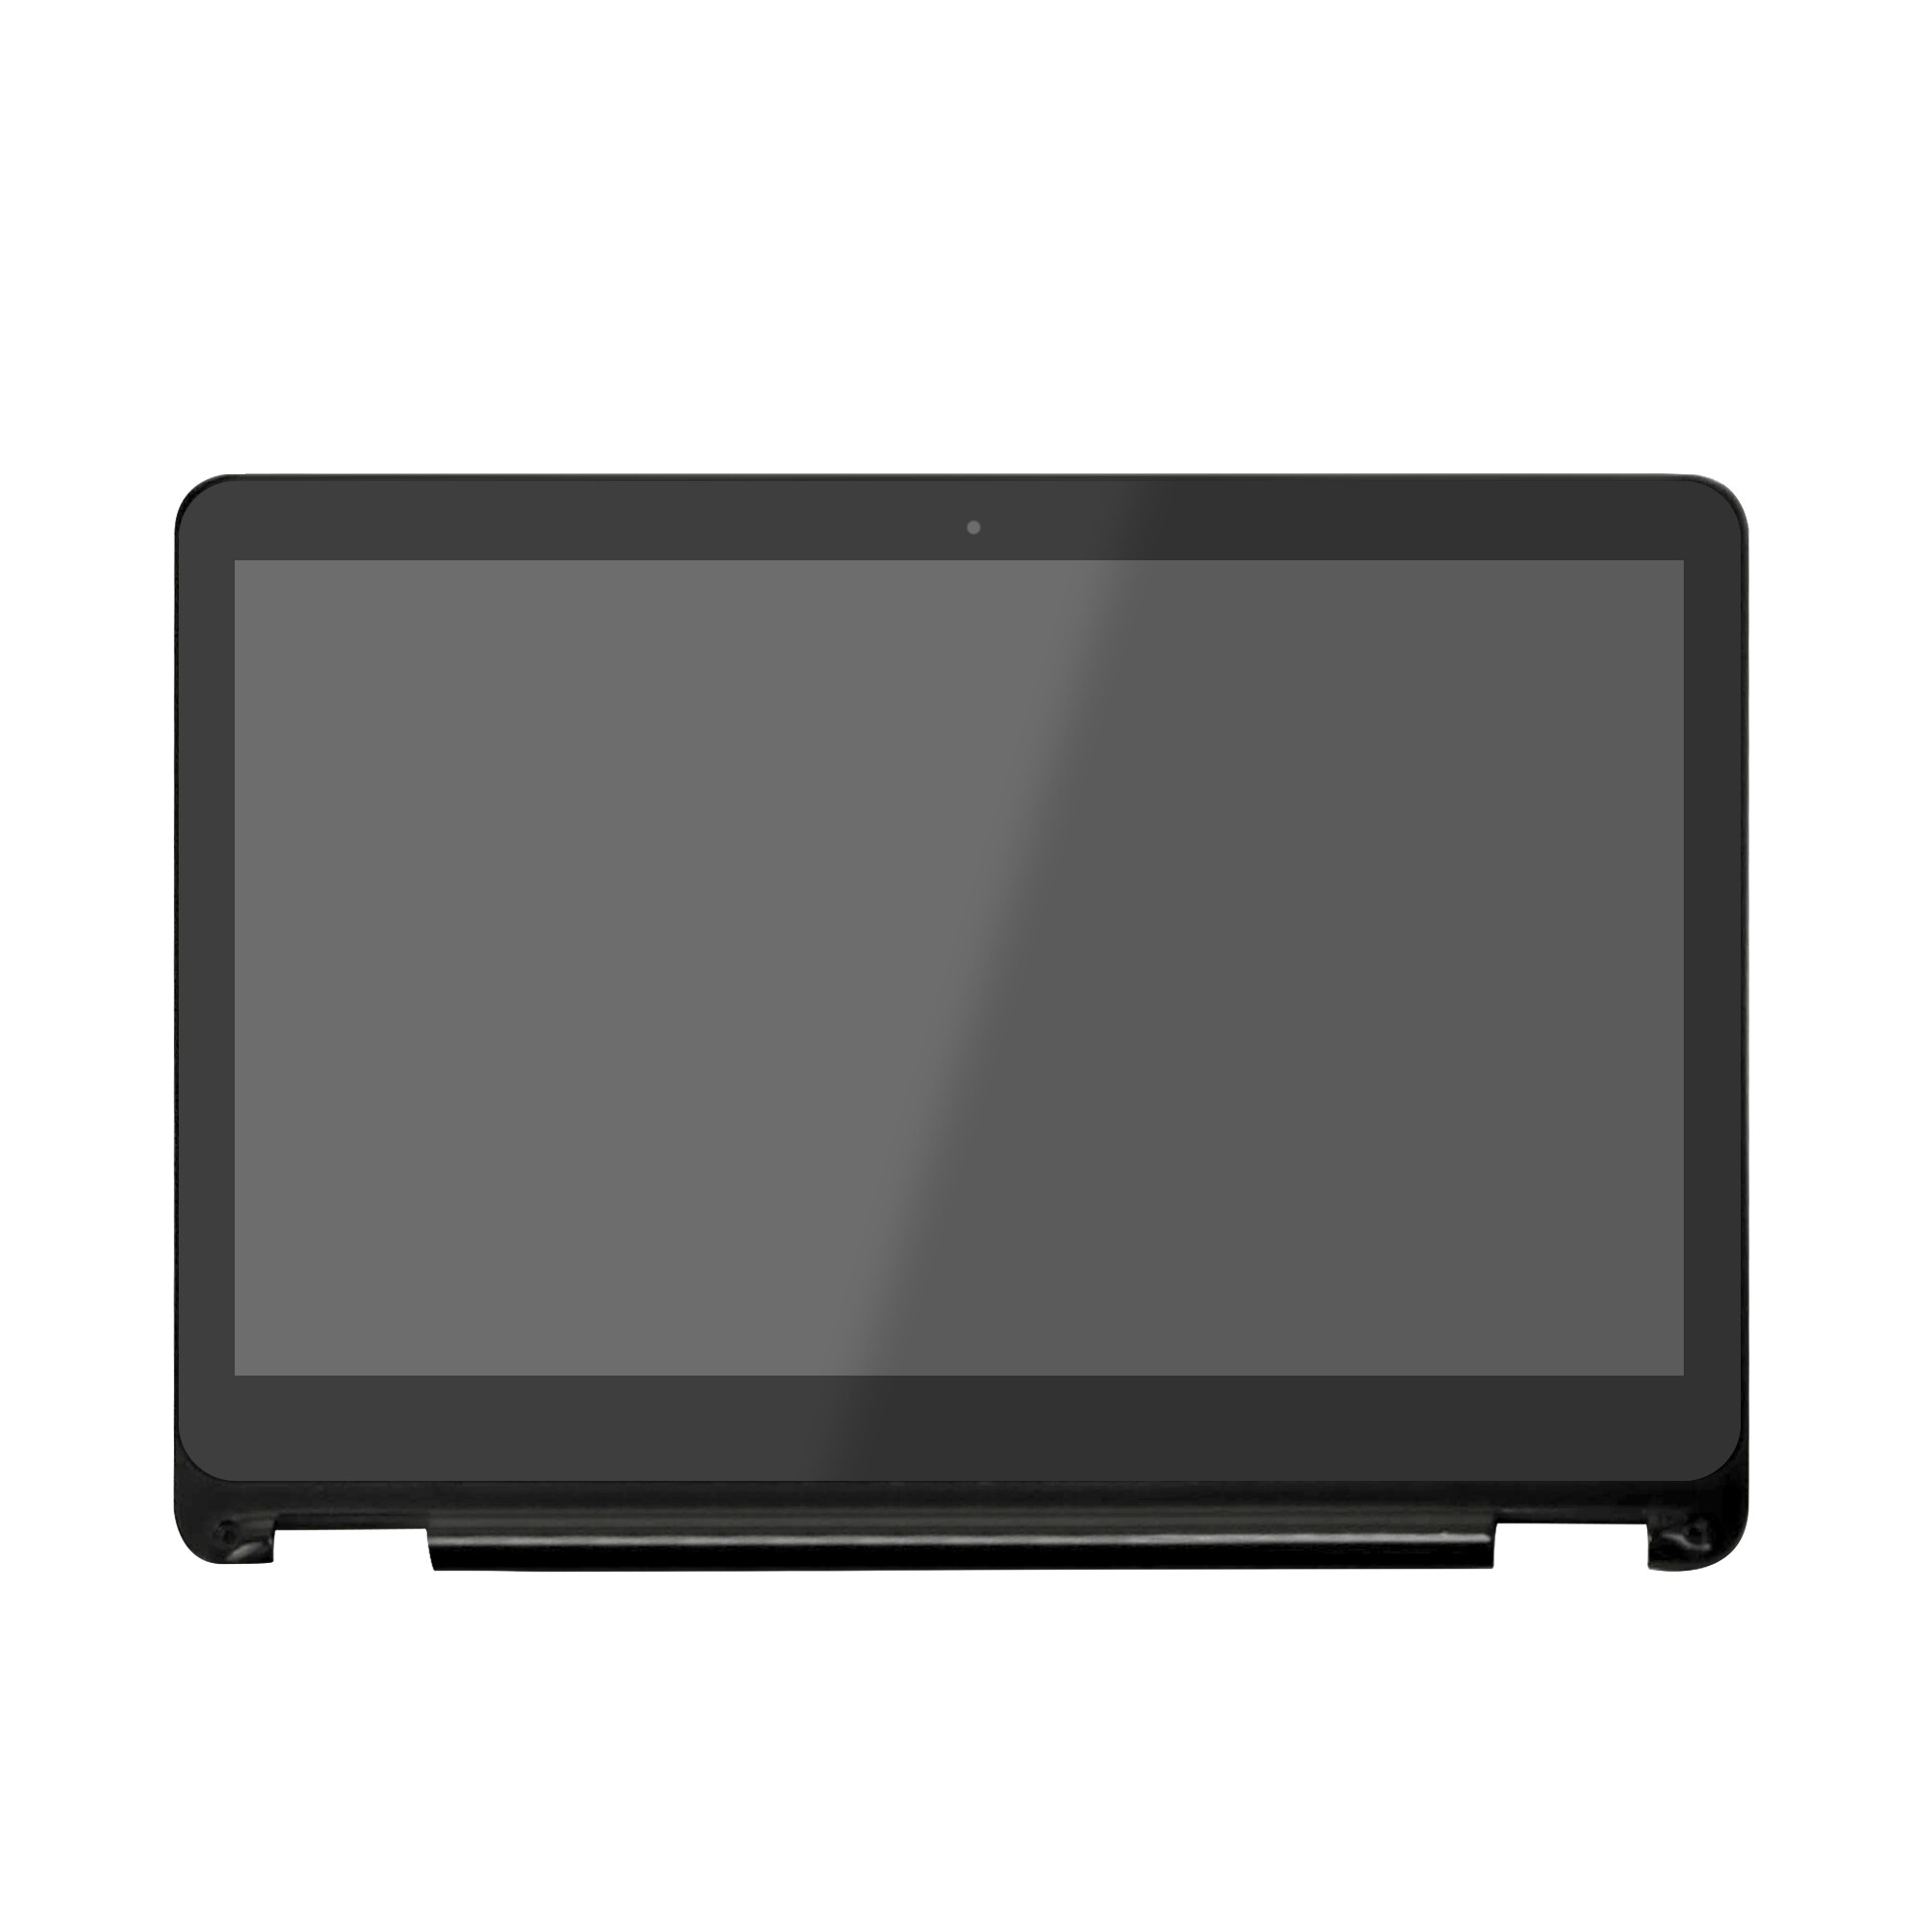 ASUS VivoBook Flip TP301 TP301U TP301UA Front Touch Screen Glass Digitizer New